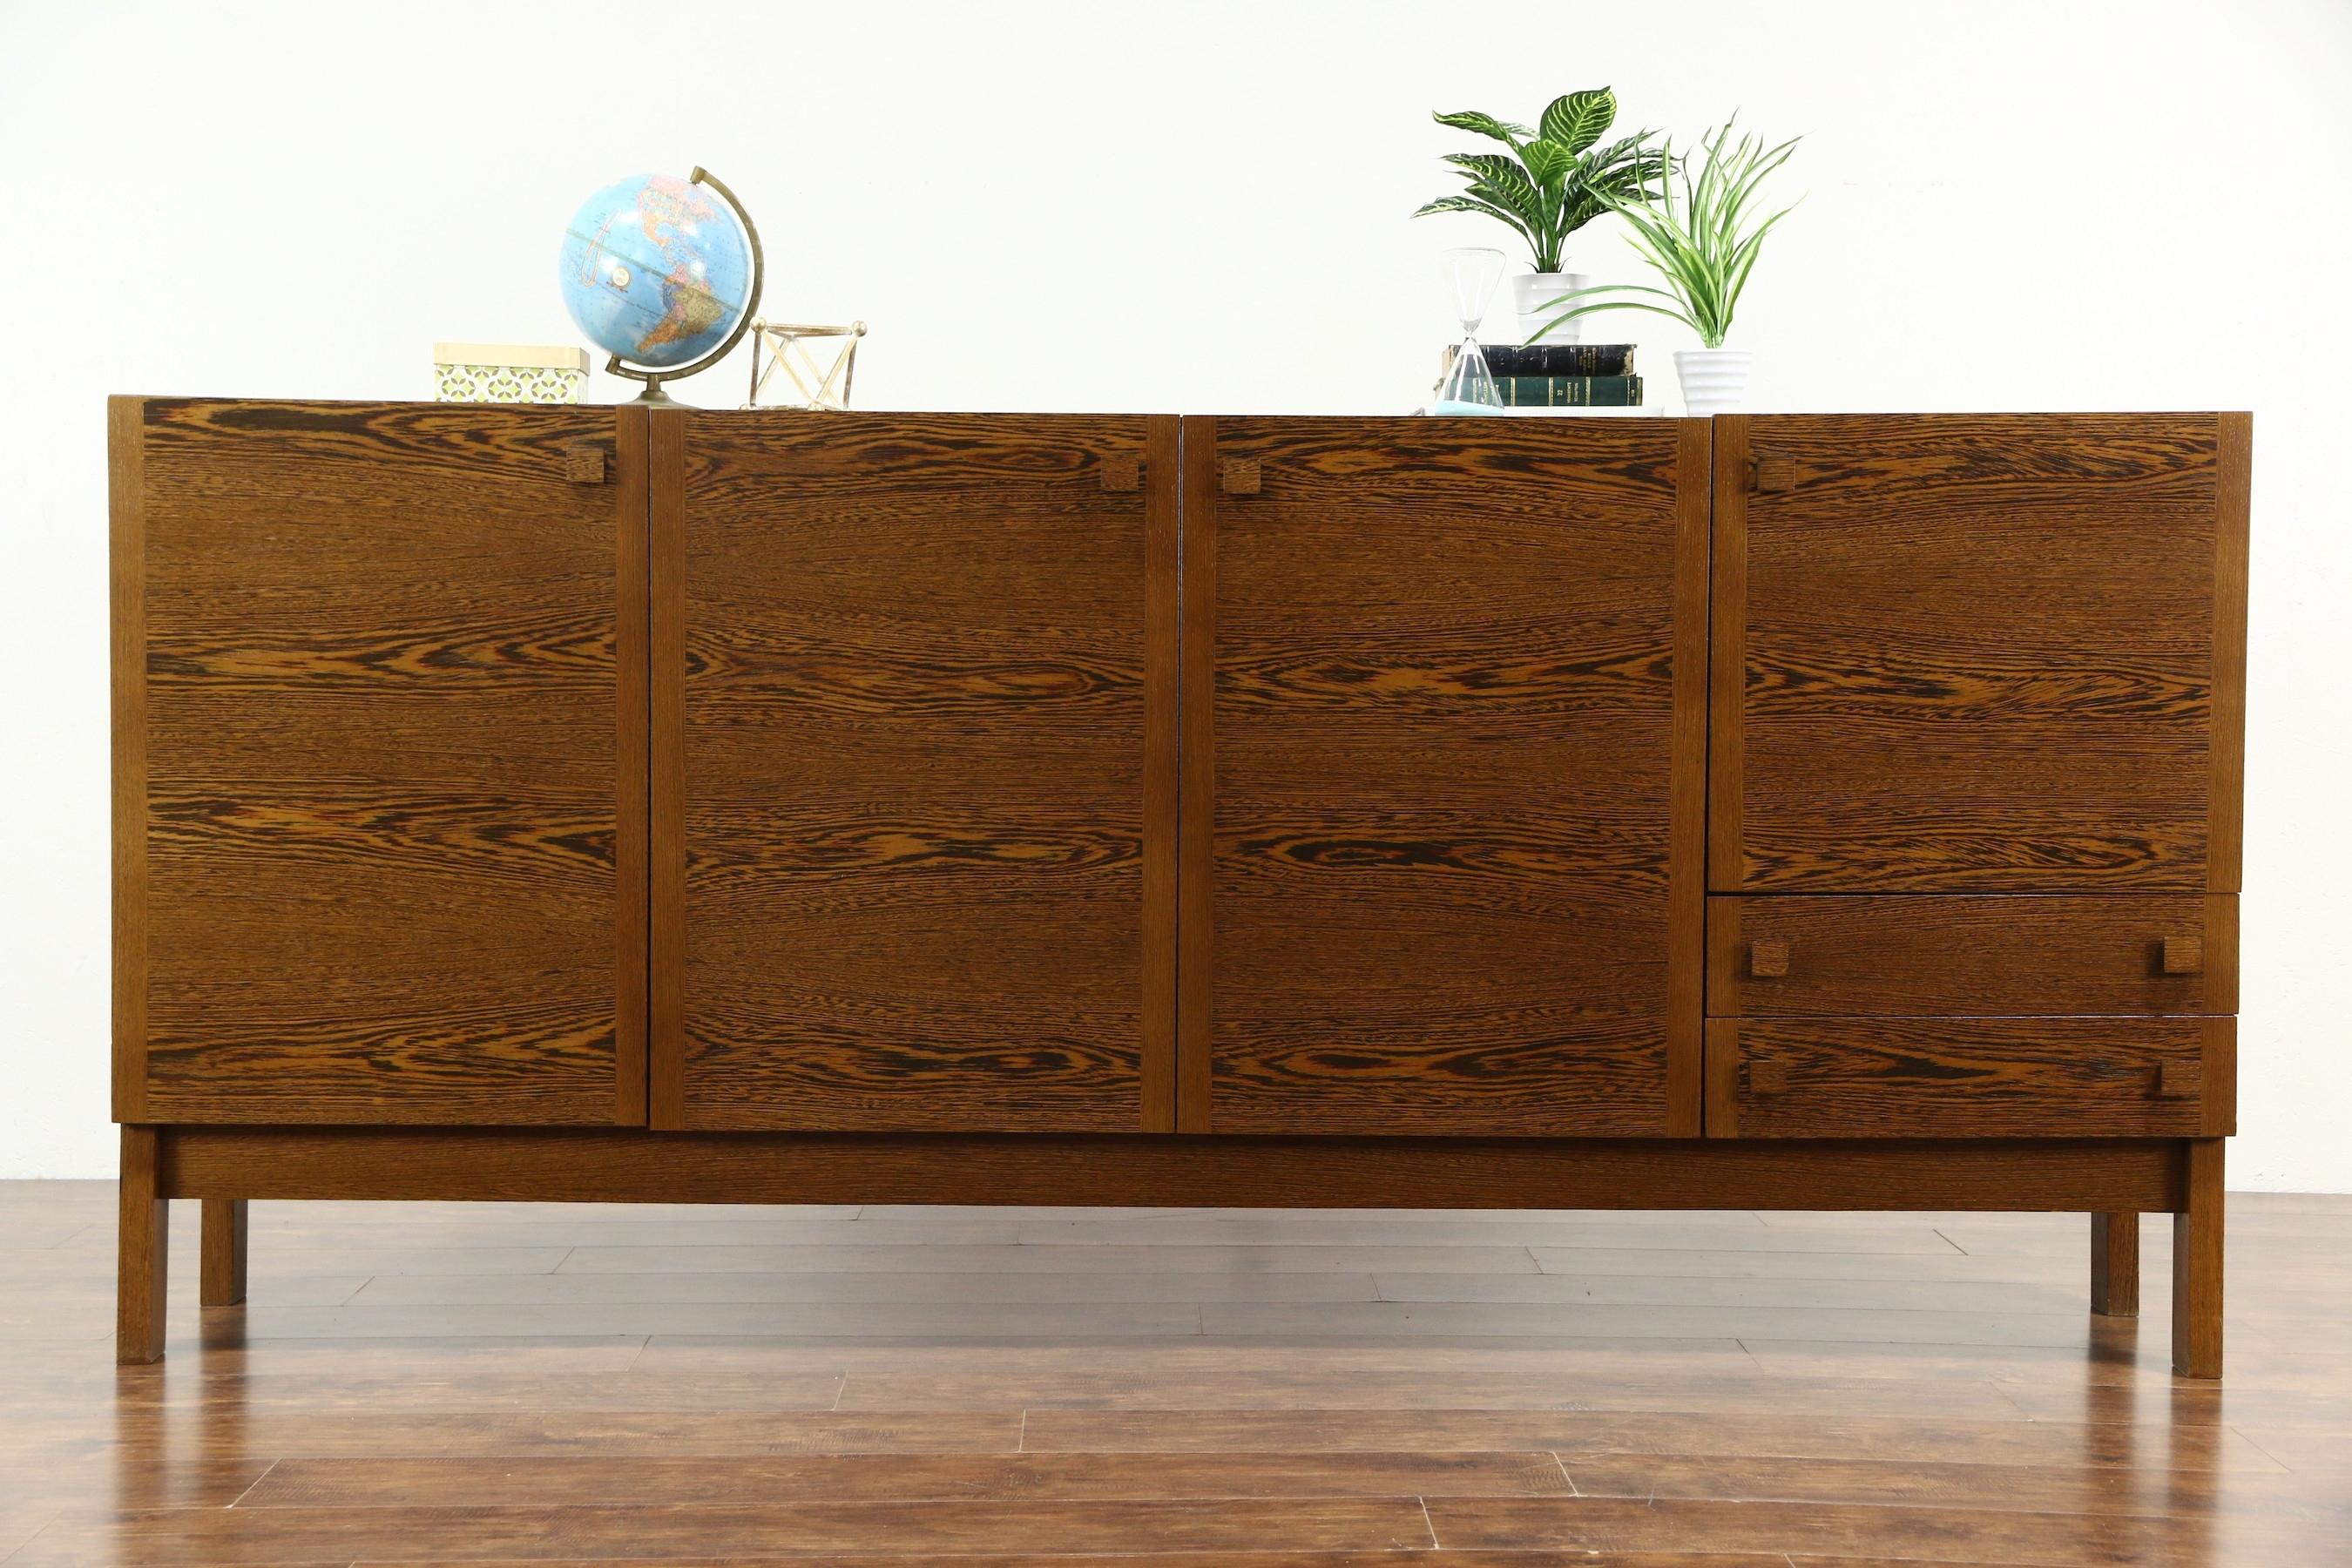 Sold – Midcentury Danish Modern Panga Panga 60's Vintage Sideboard With Regard To Latest Vintage Brown Textured Sideboards (View 7 of 20)